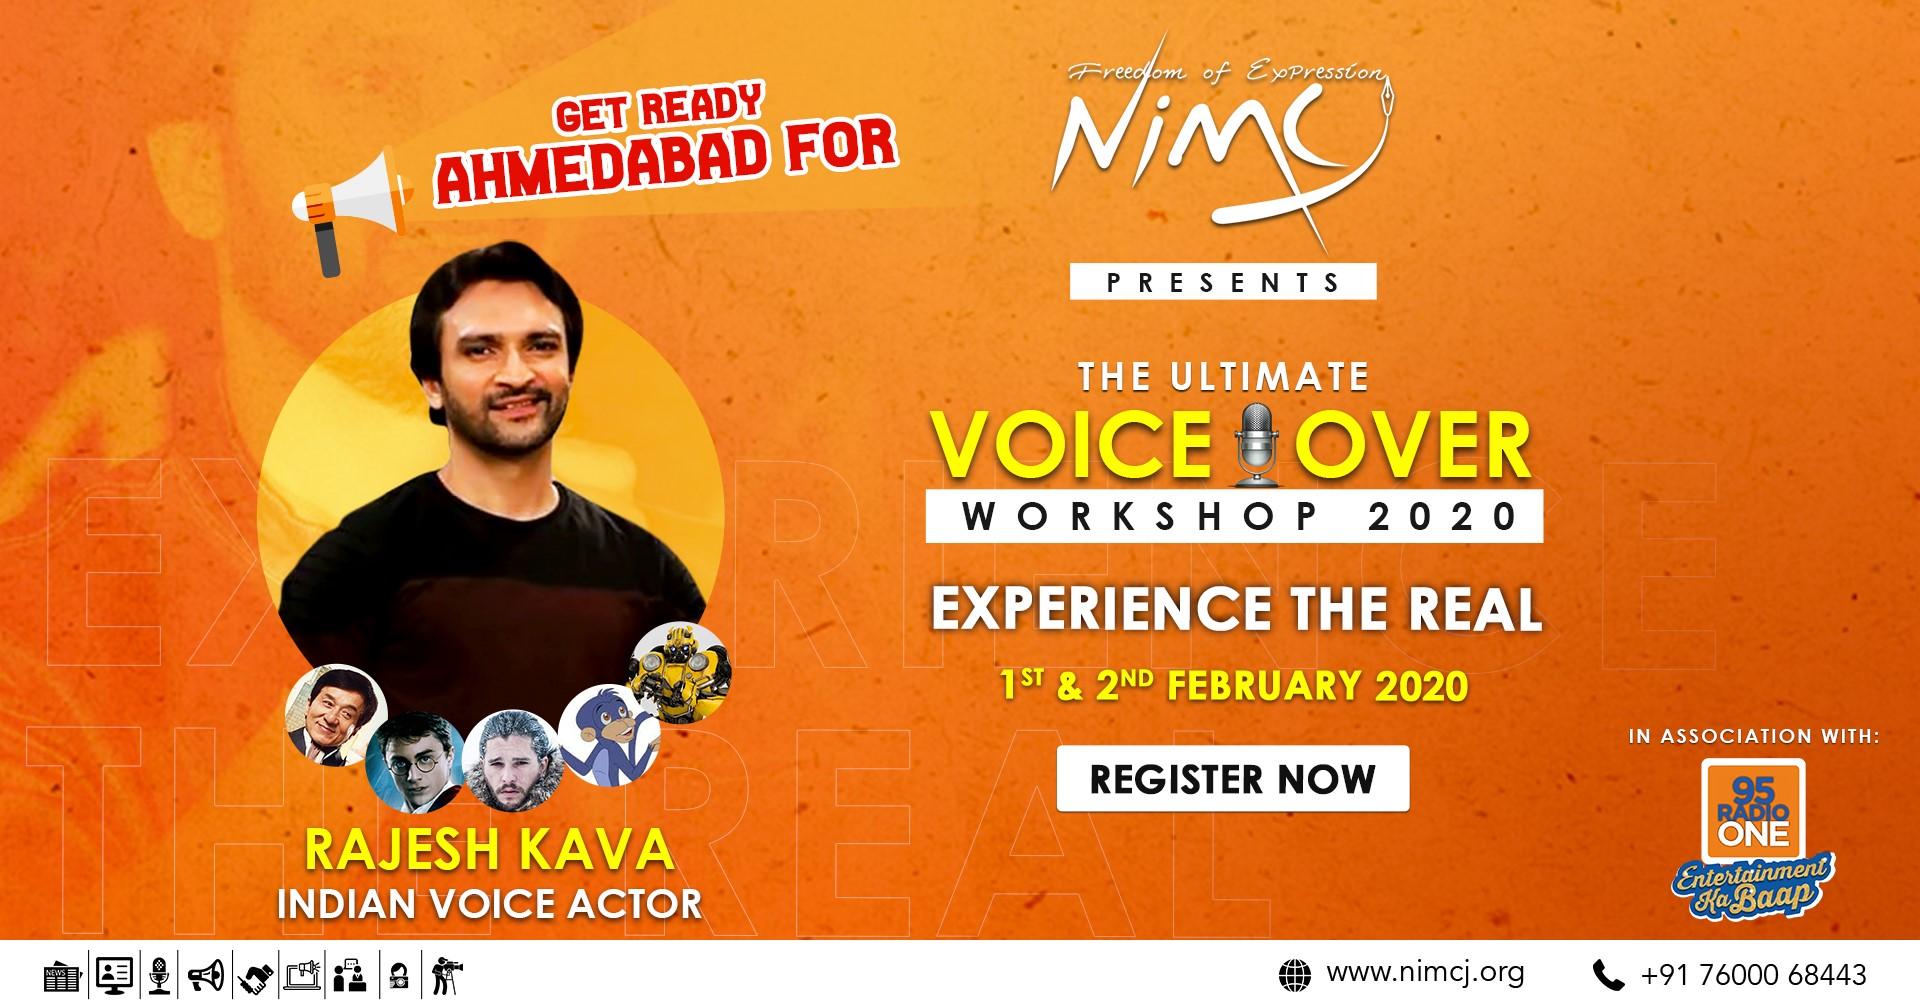 https://creativeyatra.com/wp-content/uploads/2020/01/The-Ultimate-Voice-Over-Workshop-2020.jpg